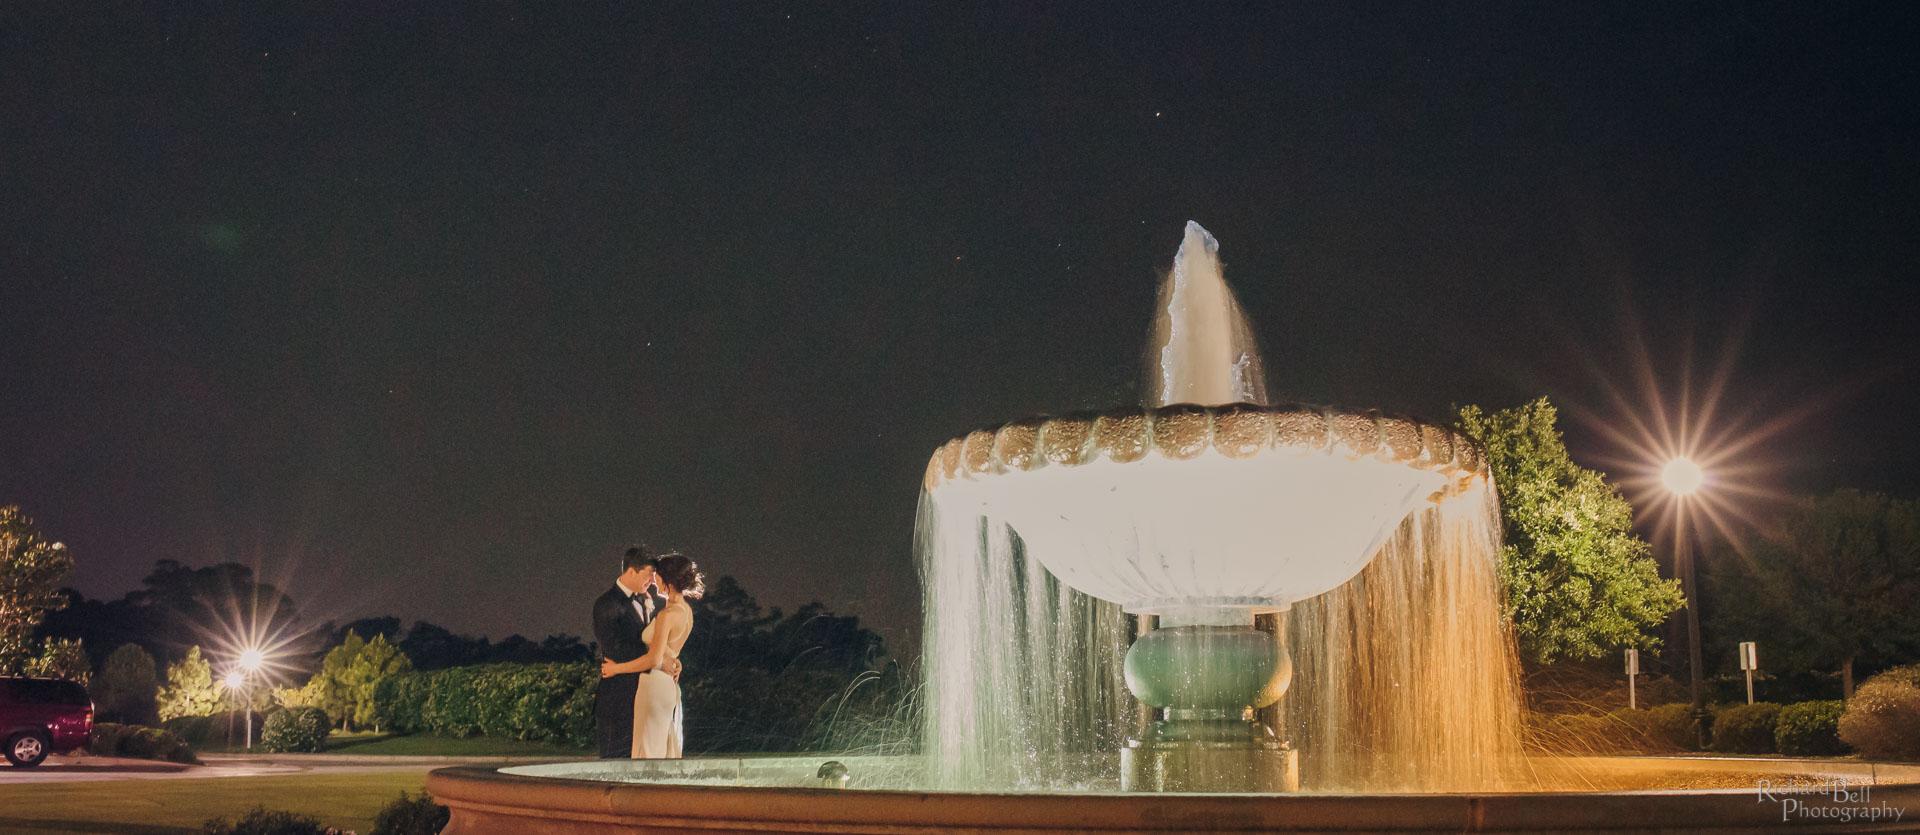 Night at Fountain